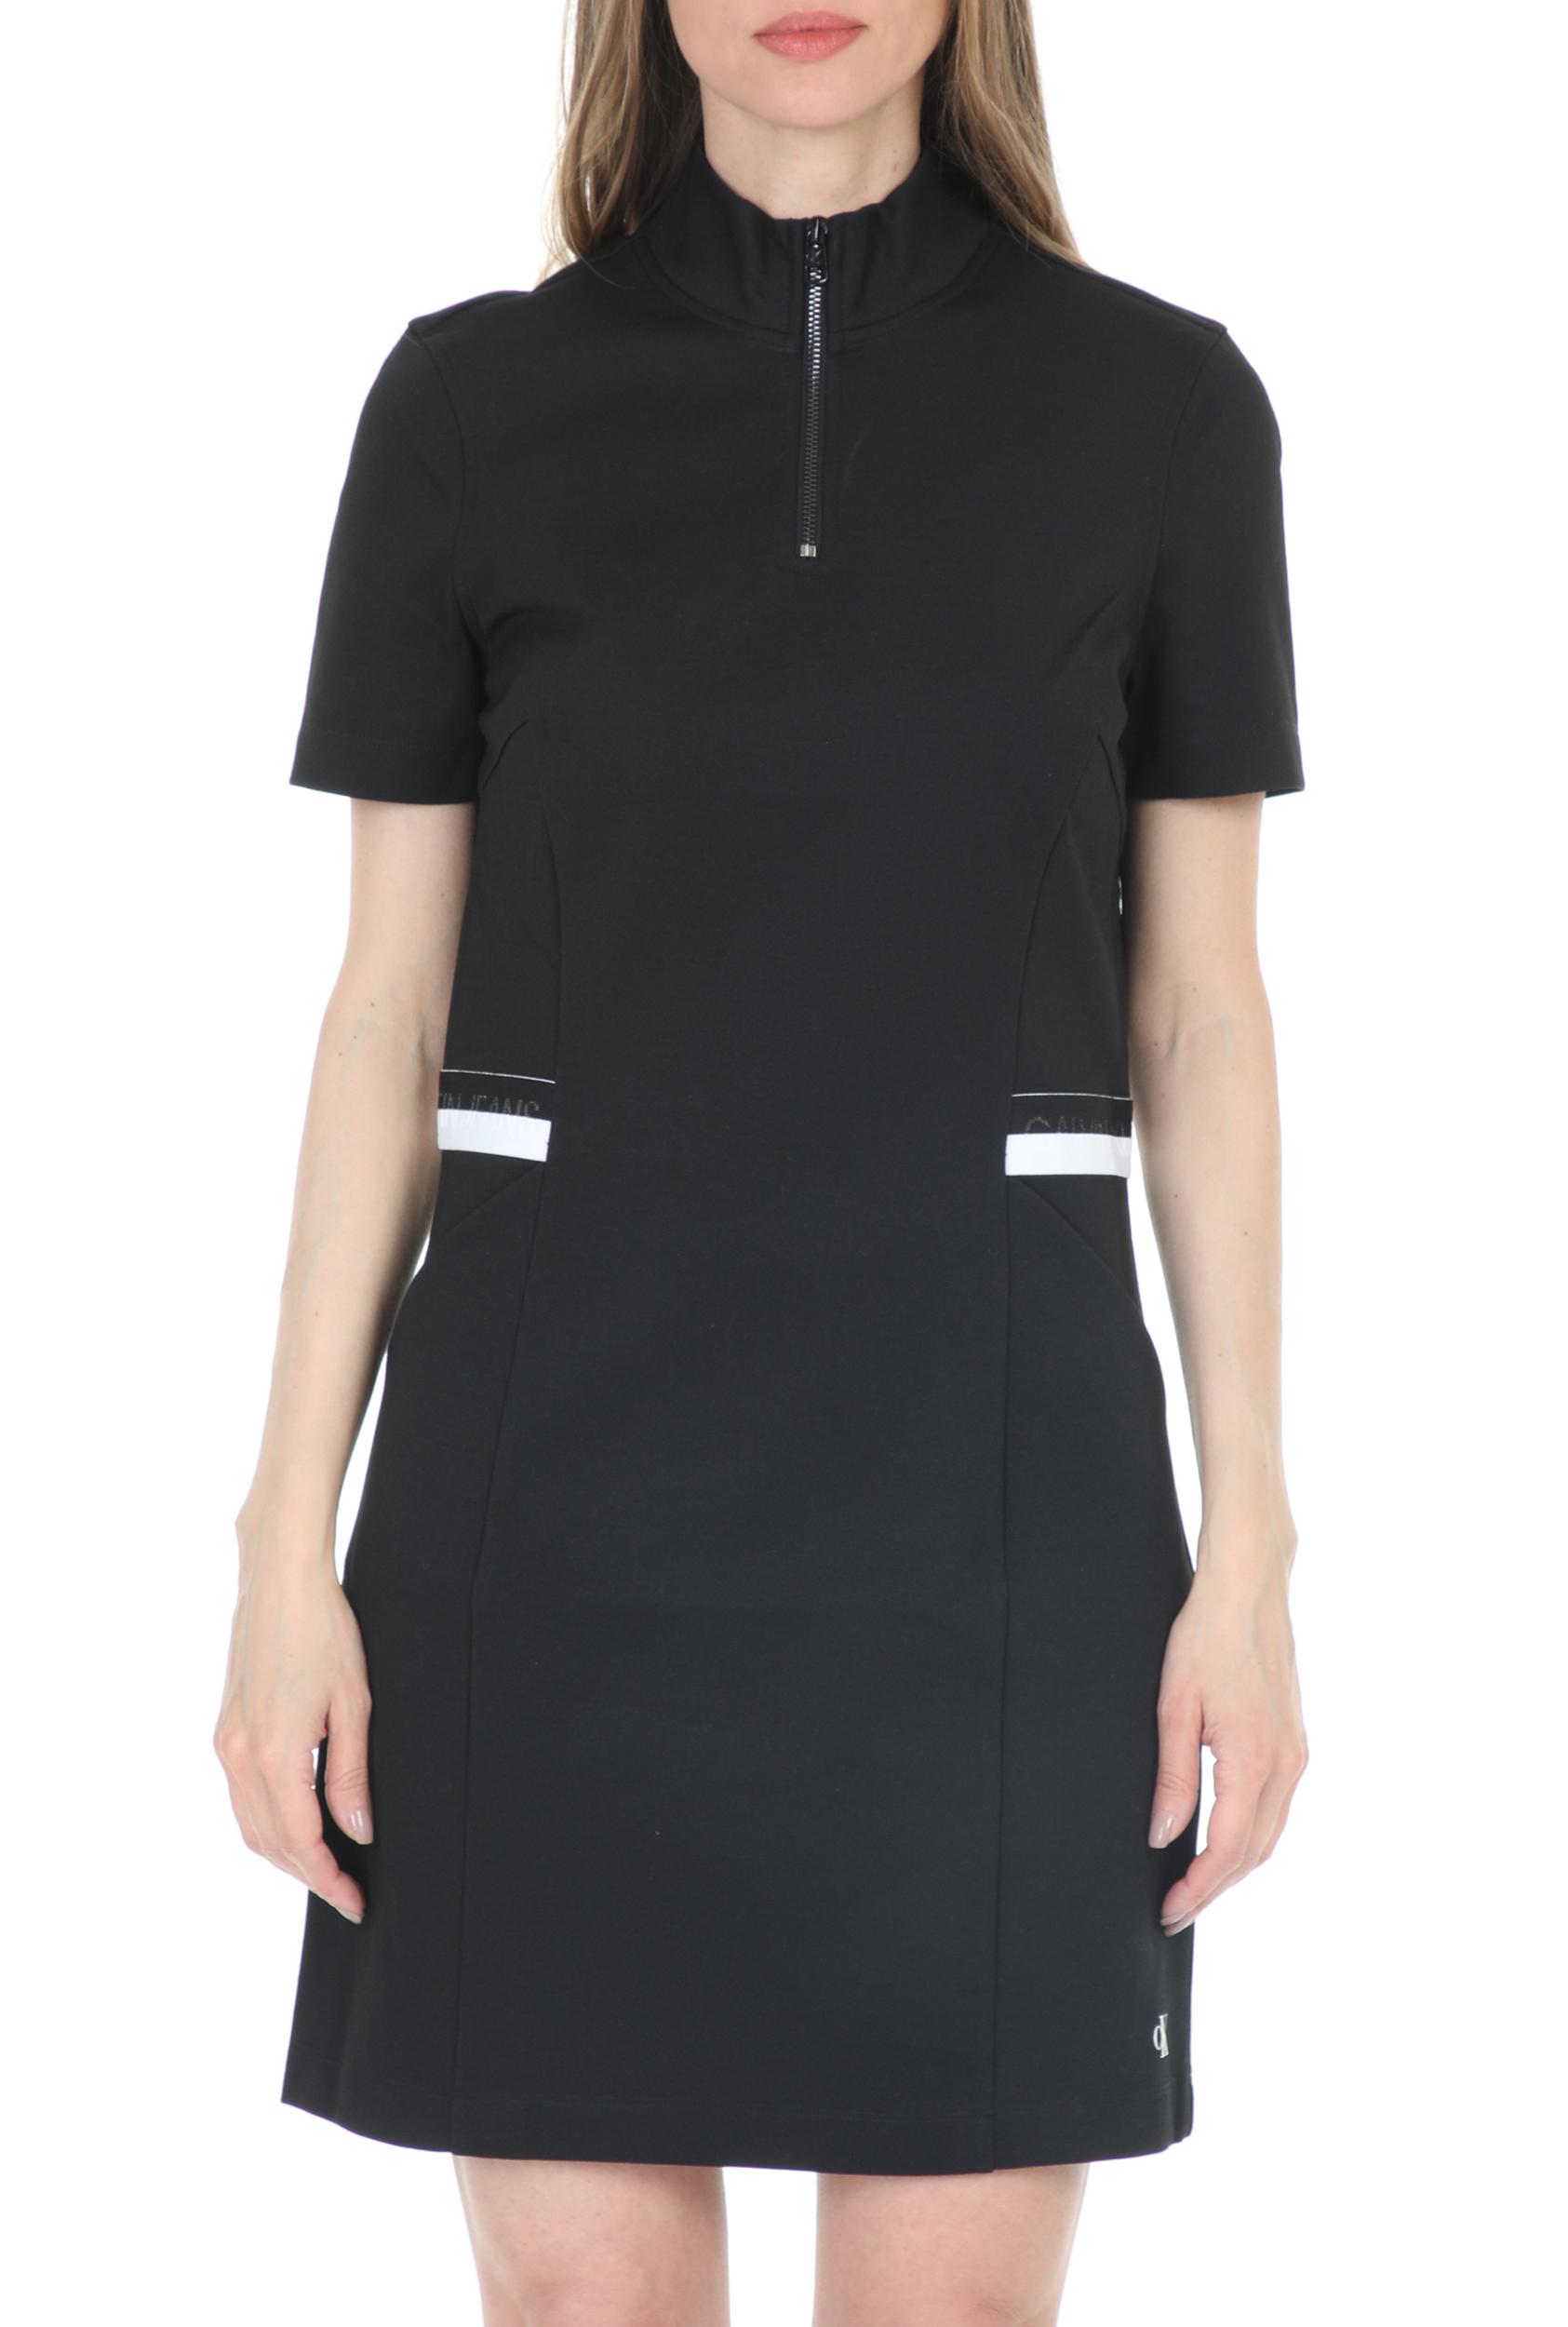 CALVIN KLEIN JEANS - Γυναικείο mini φόρεμα CALVIN KLEIN JEANS MILANO μαύρο